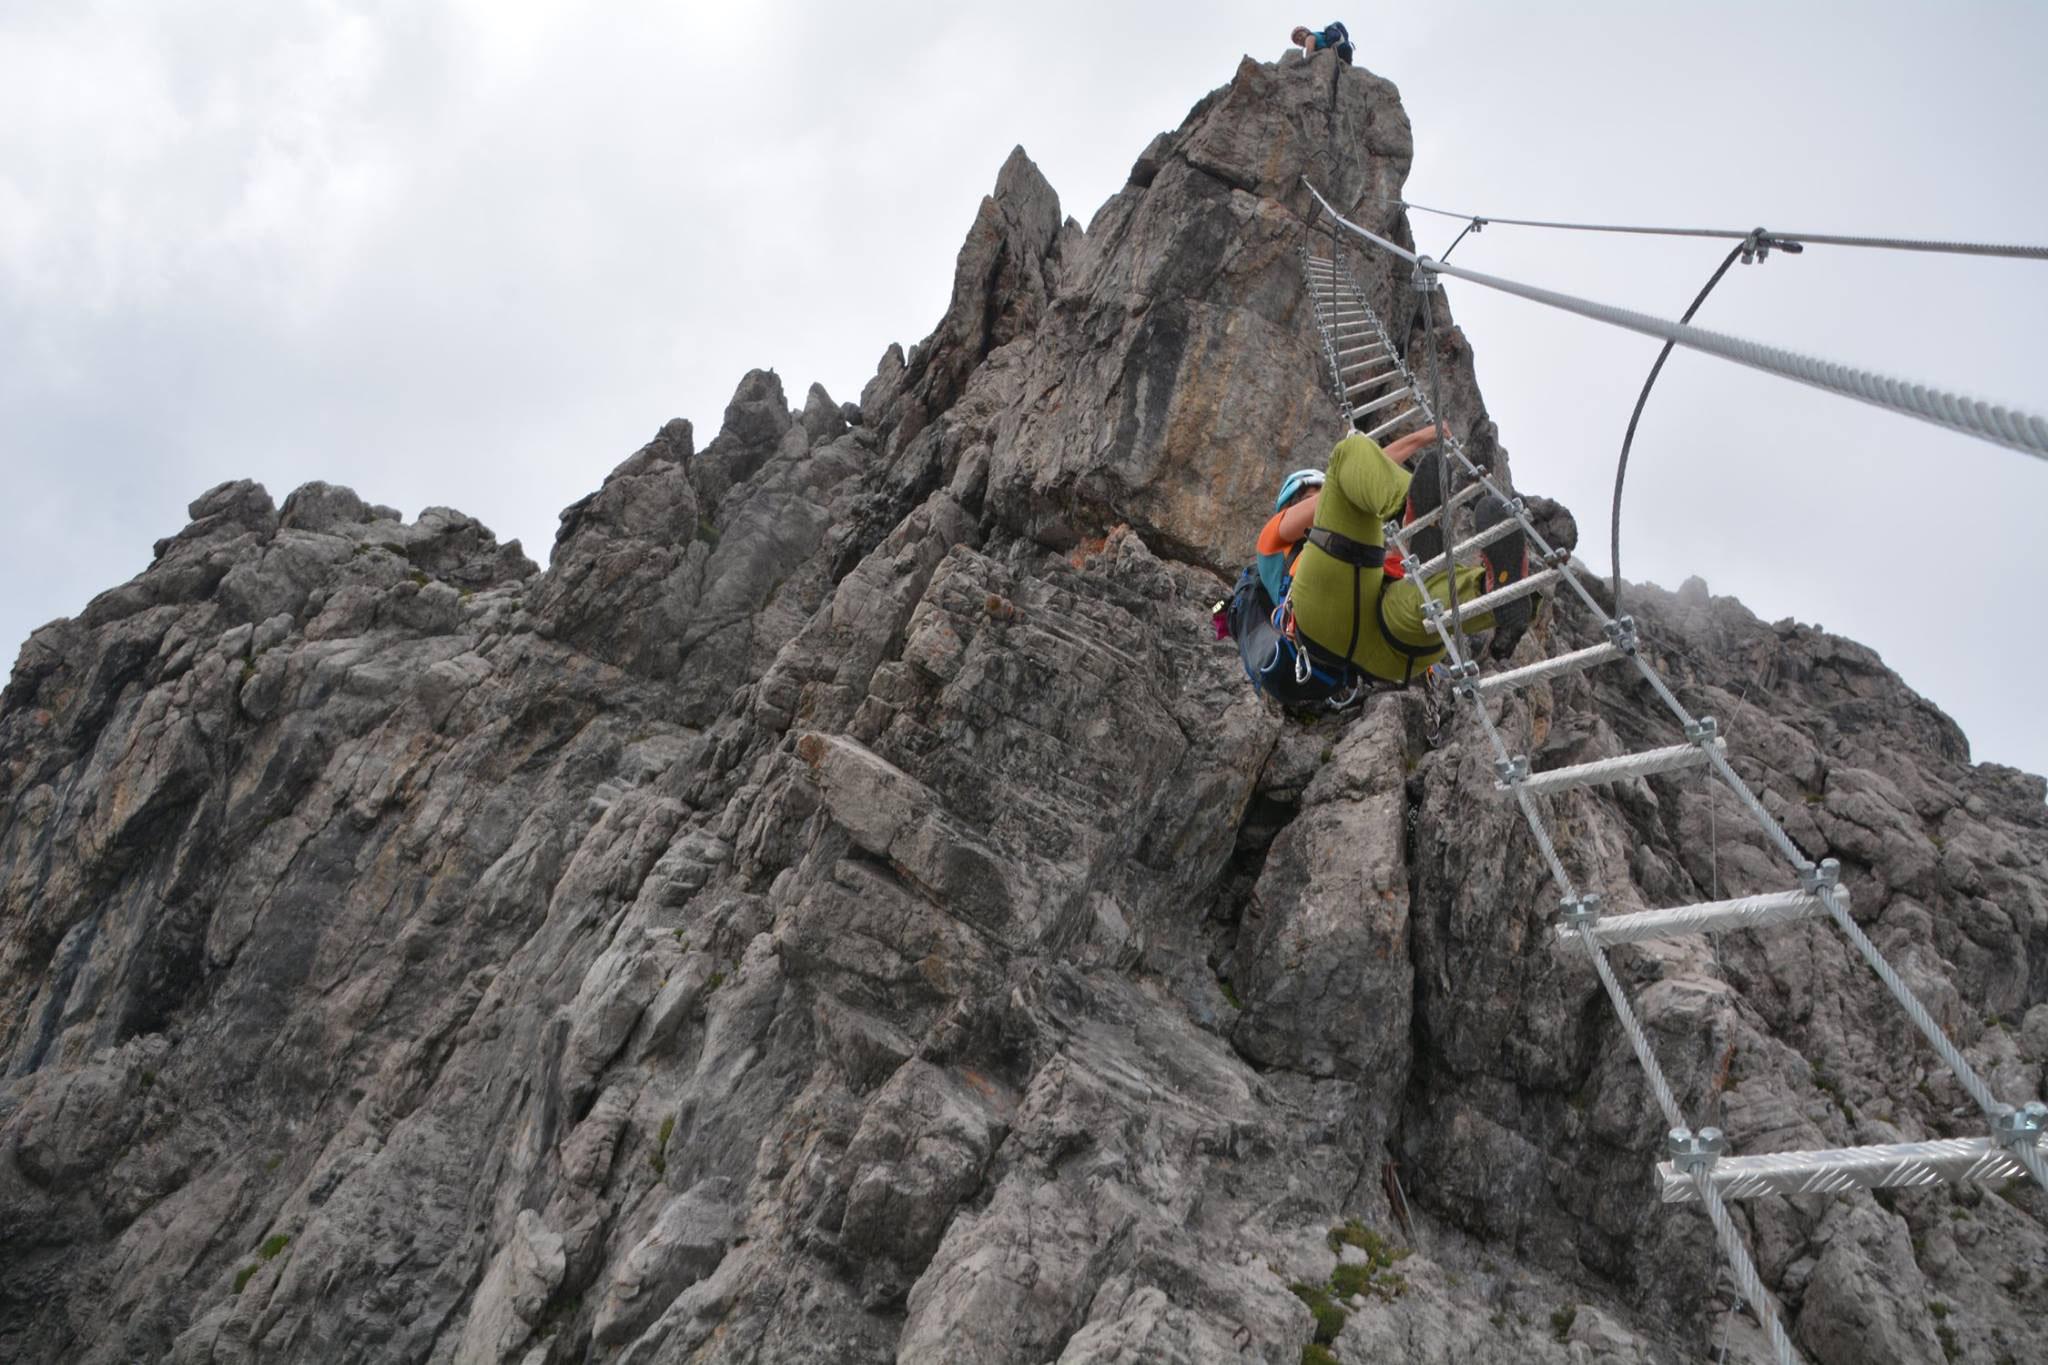 Klettersteig Saulakopf : Saulakopf klettersteig falta rock climbers webseite